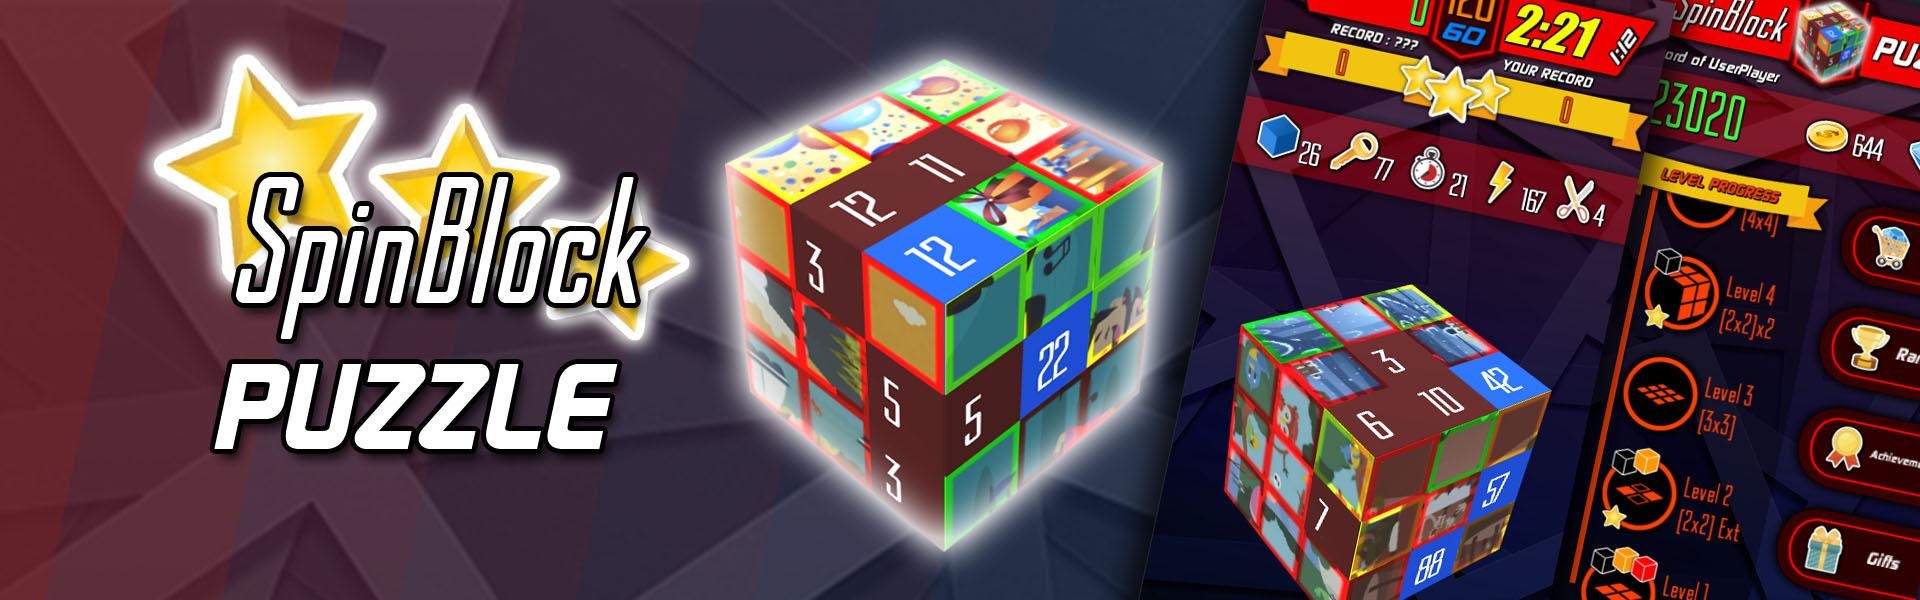 BannerWebSpinBlockPuzzle